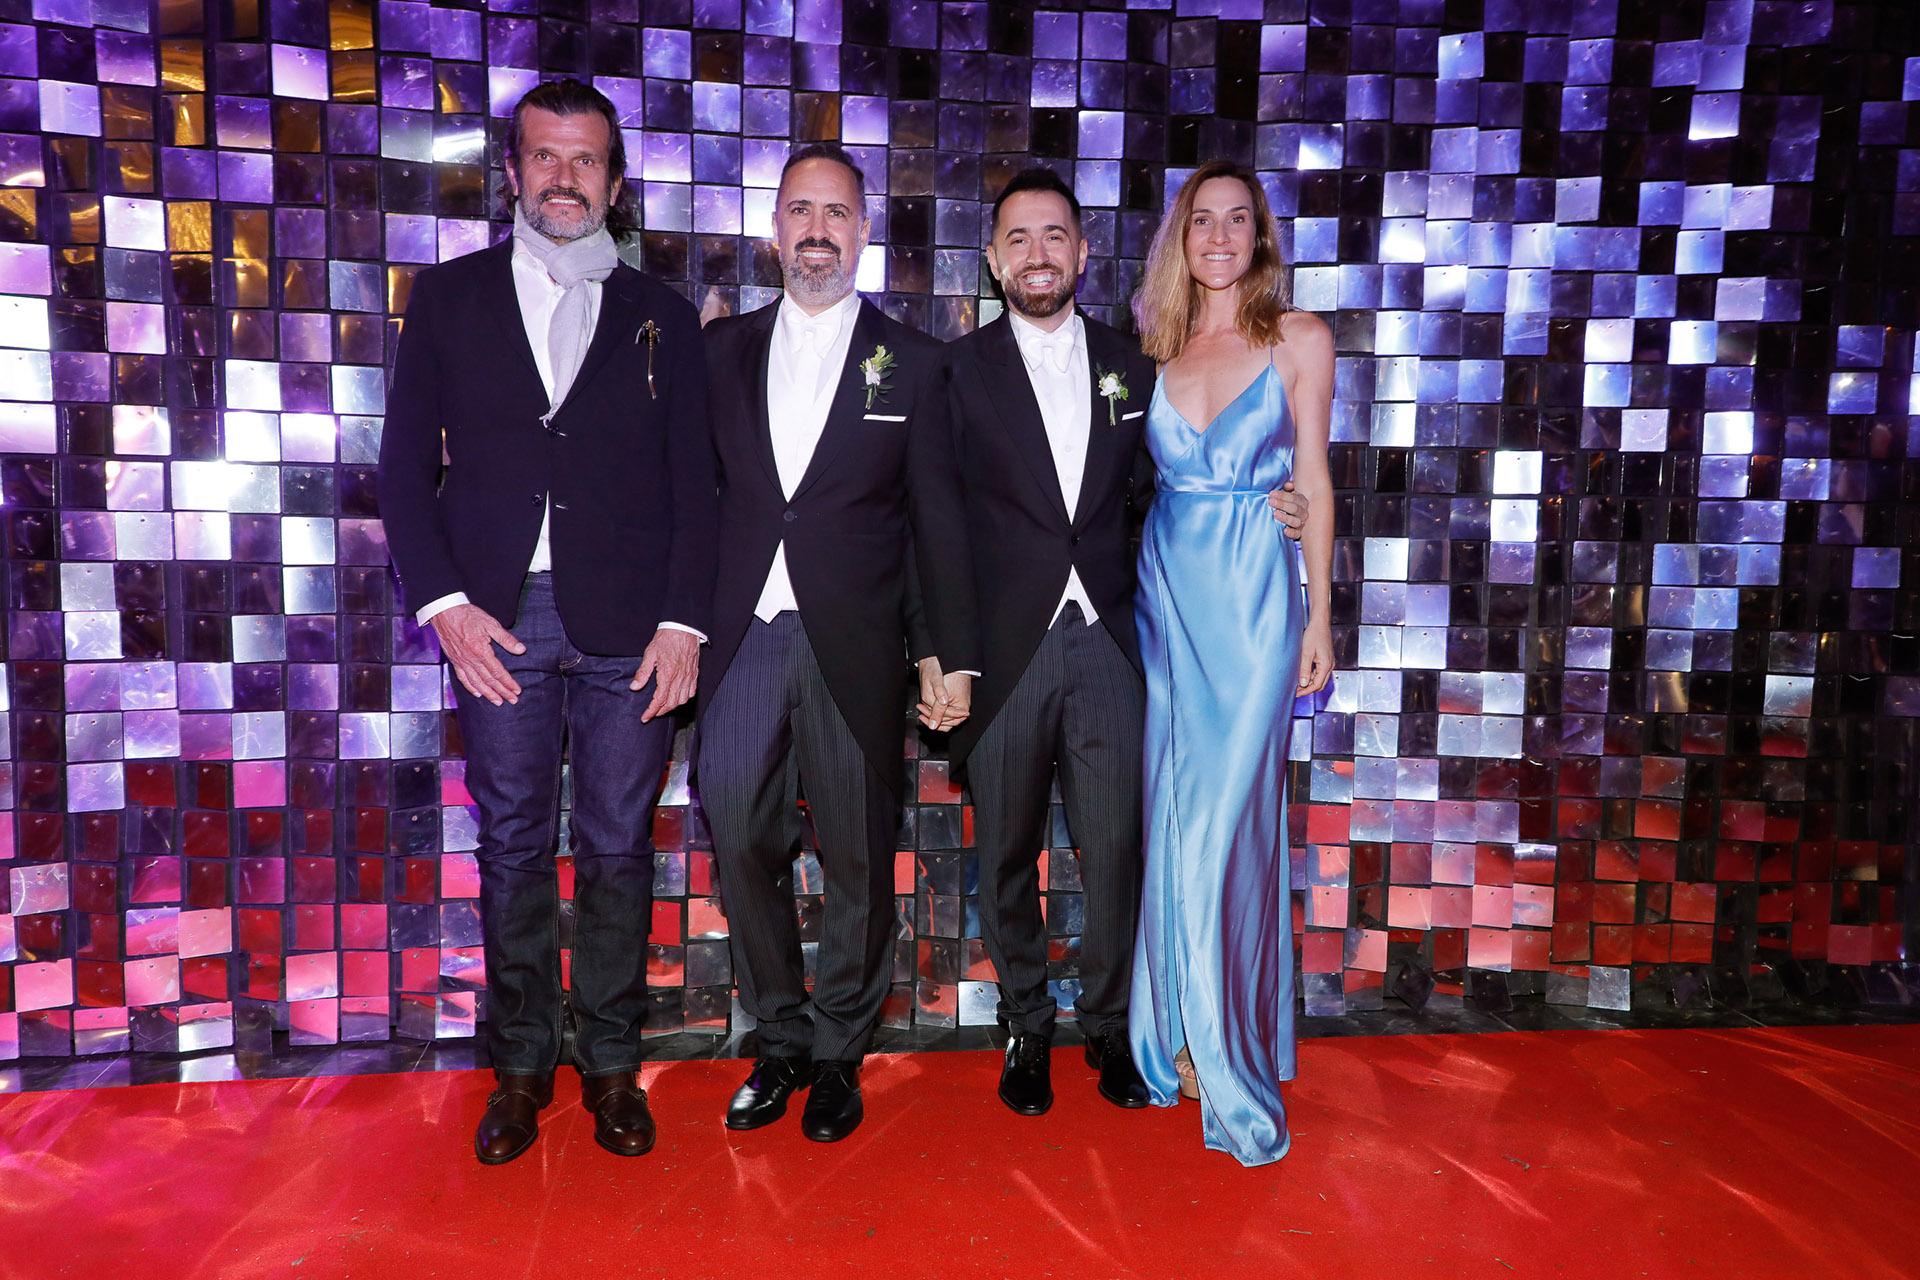 Federico Álvarez Castillo, Charly Ronco, Nicolás Pottery y Lara Bernasconi